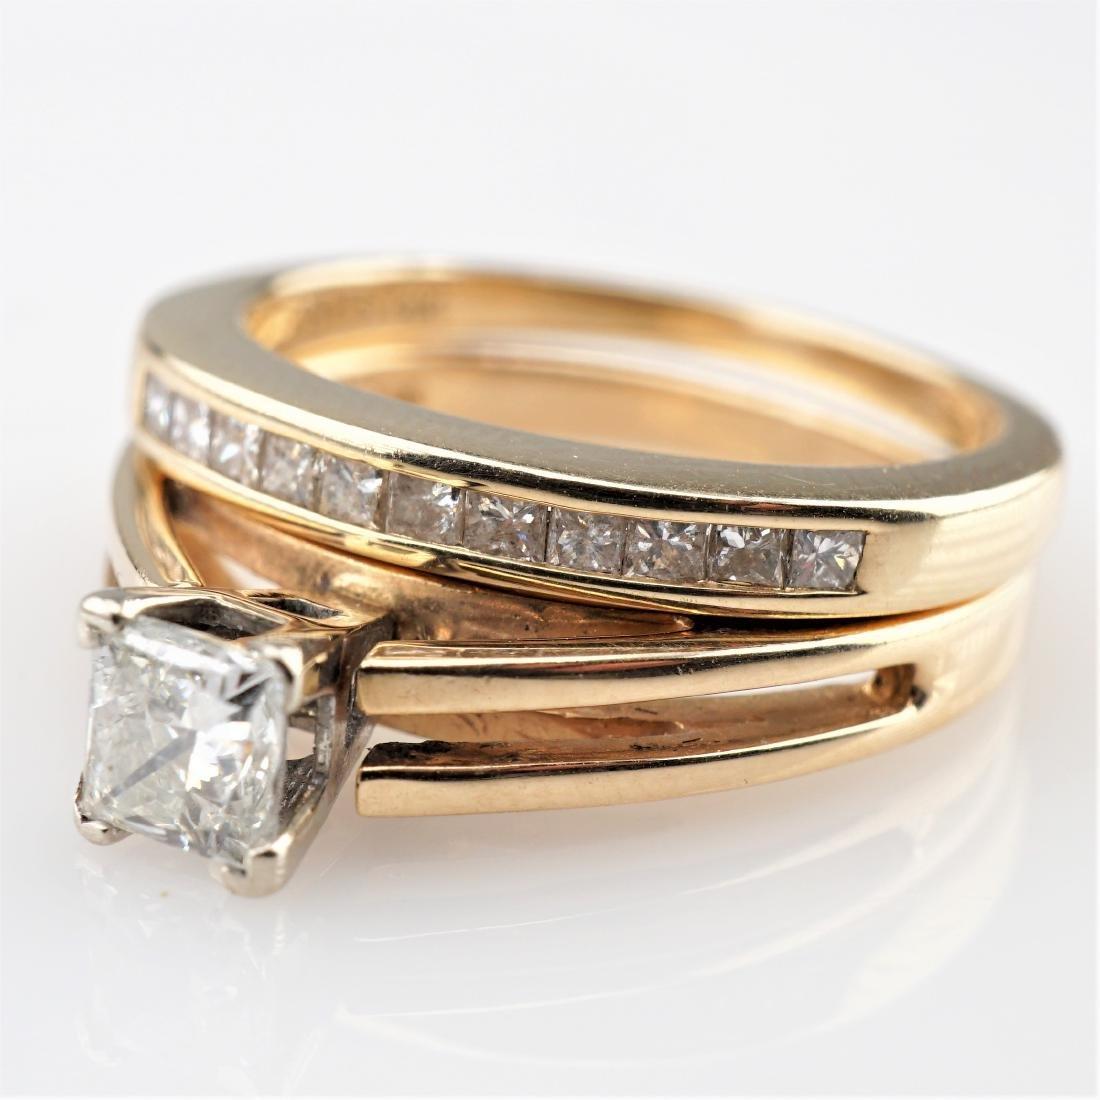 14k YG/WG Diamond Engagement Ring sz5